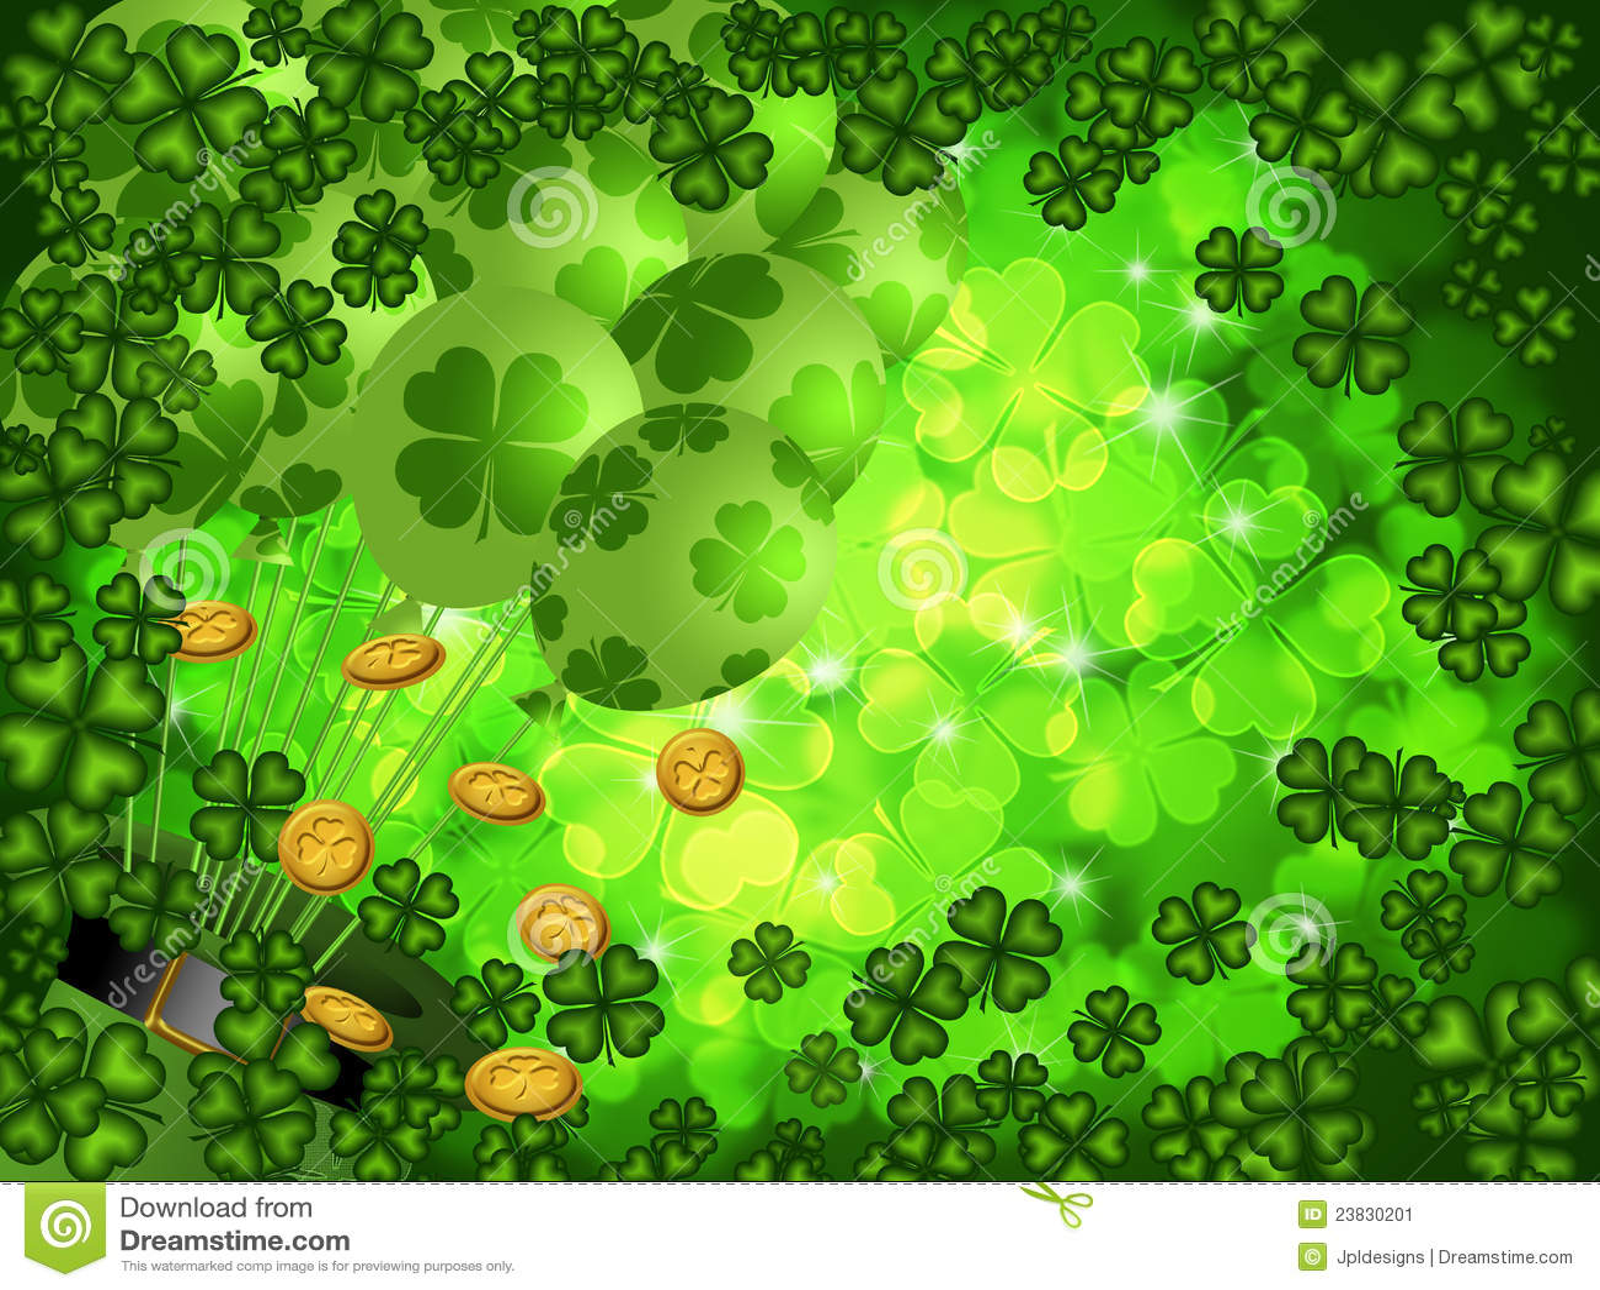 4 clovers and leprechaun in alabama soundboards